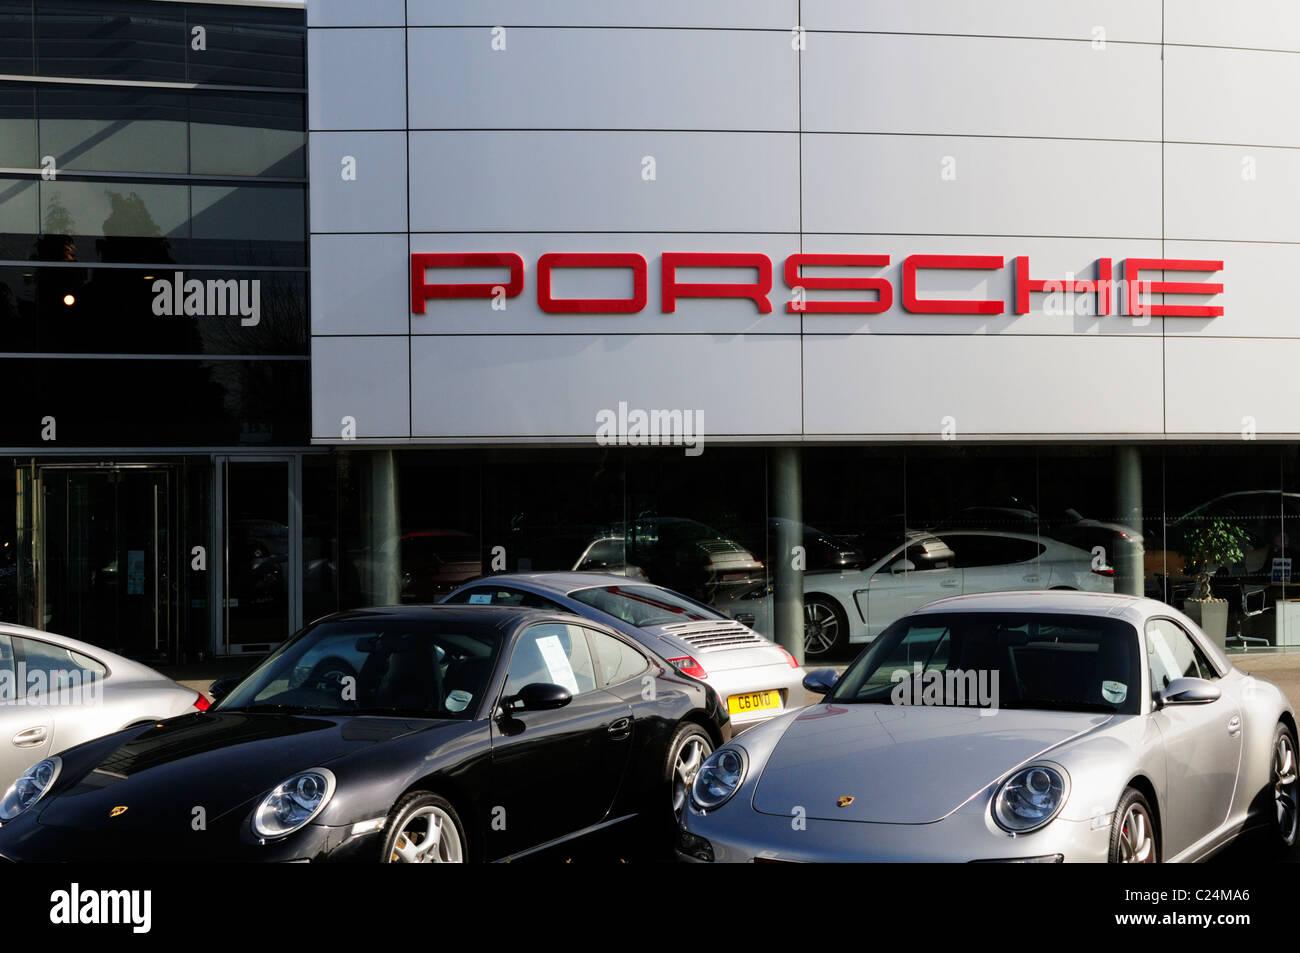 Lancaster Porsche Car Dealership, Harston, Cambridgeshire, England